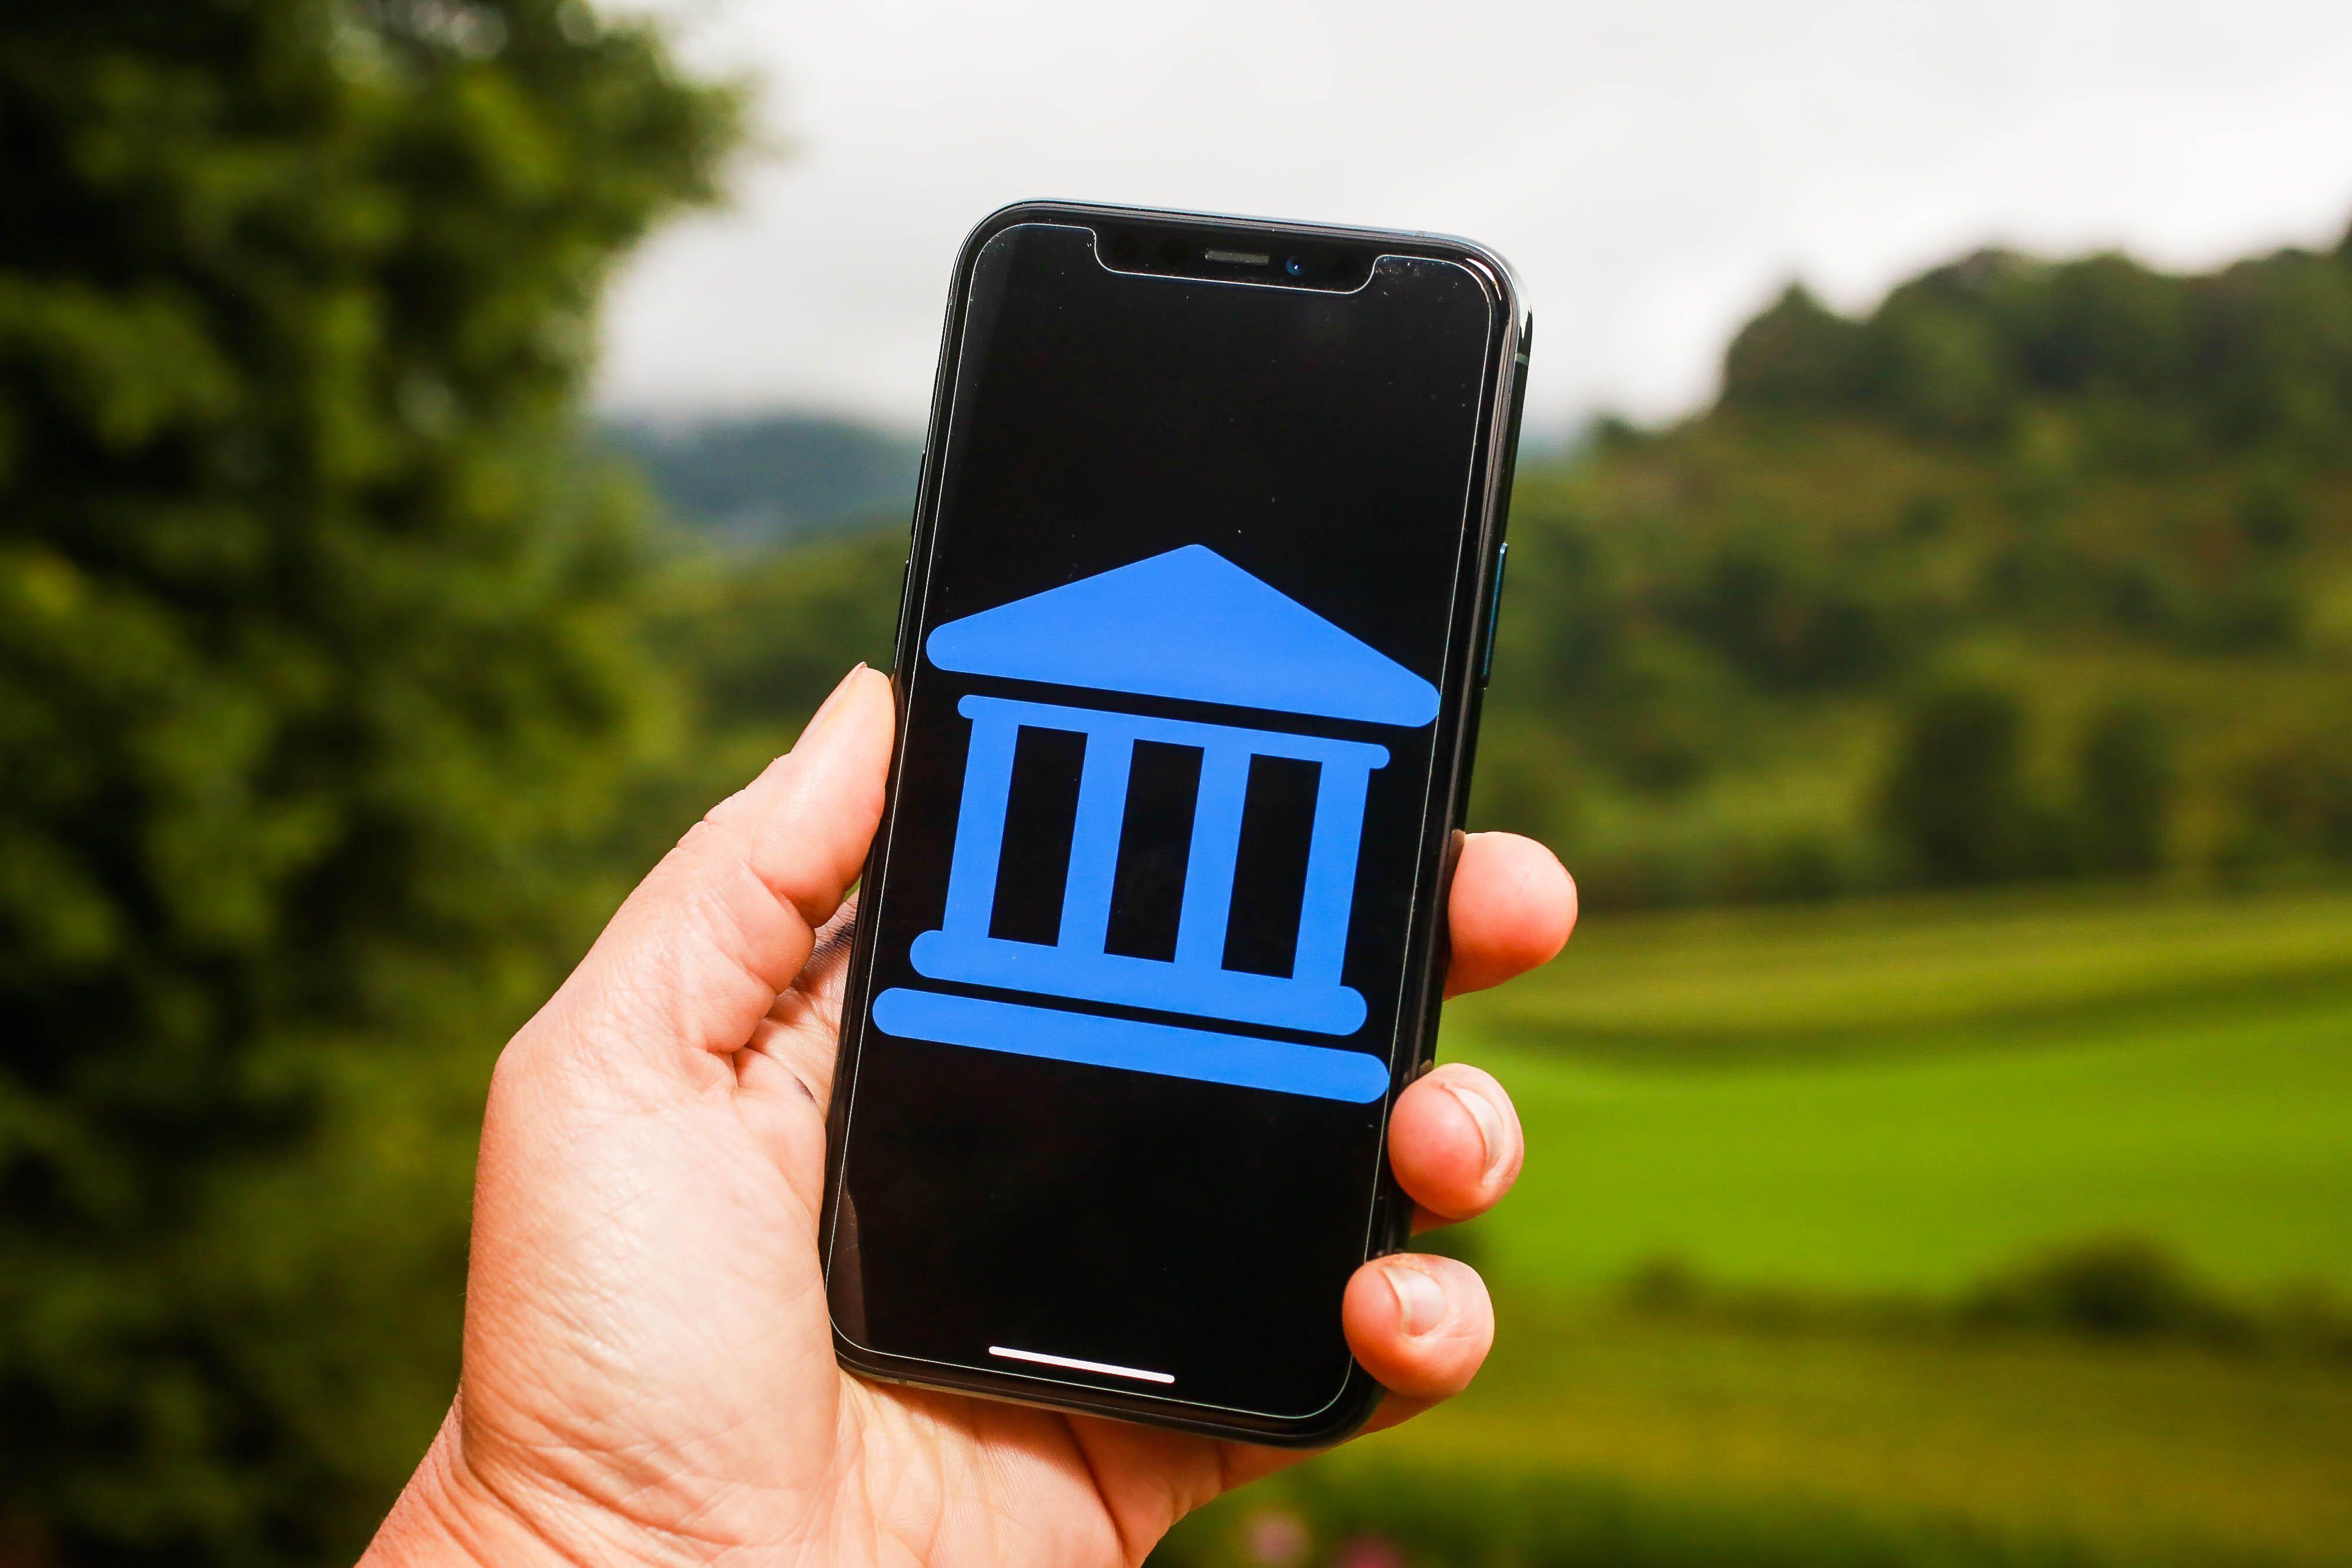 cash-money-savings-digital-banking-online-stimulus-check-phone-app-2020-008